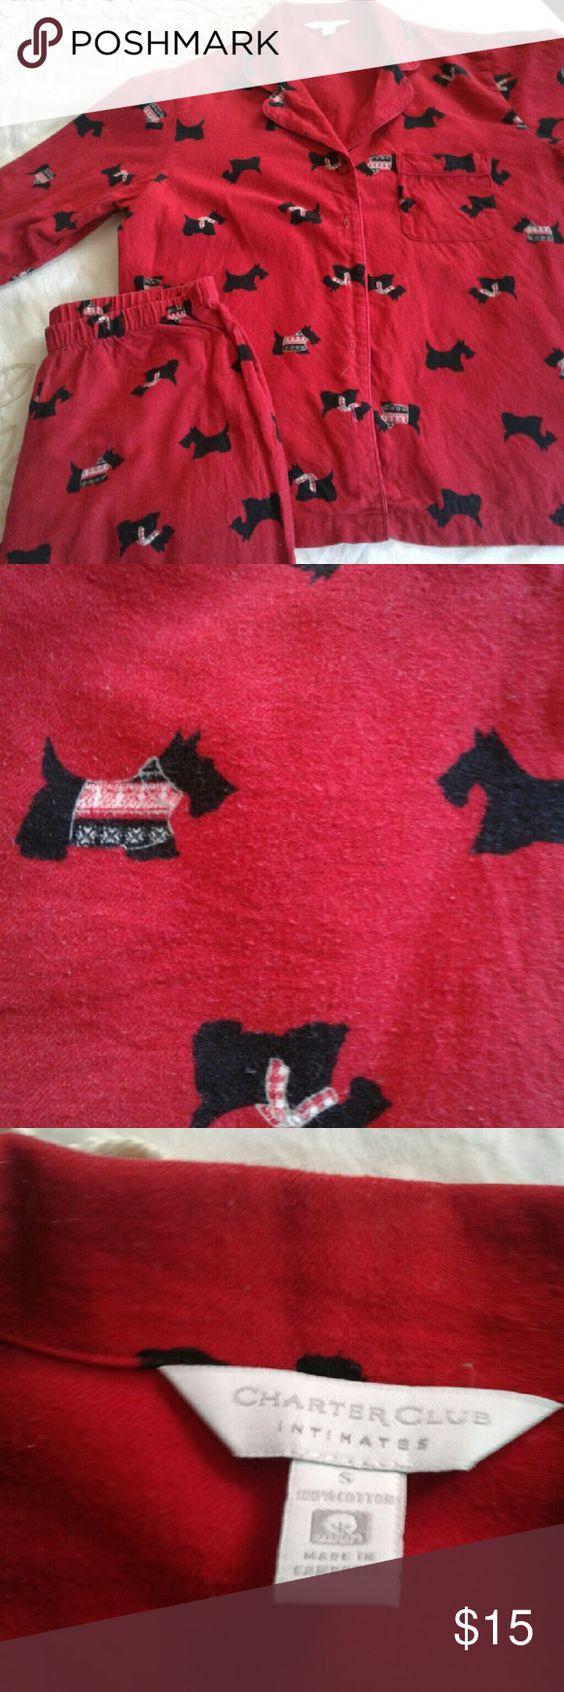 Pajamas Red flannel pajamas with assorted black Scotty dogs print